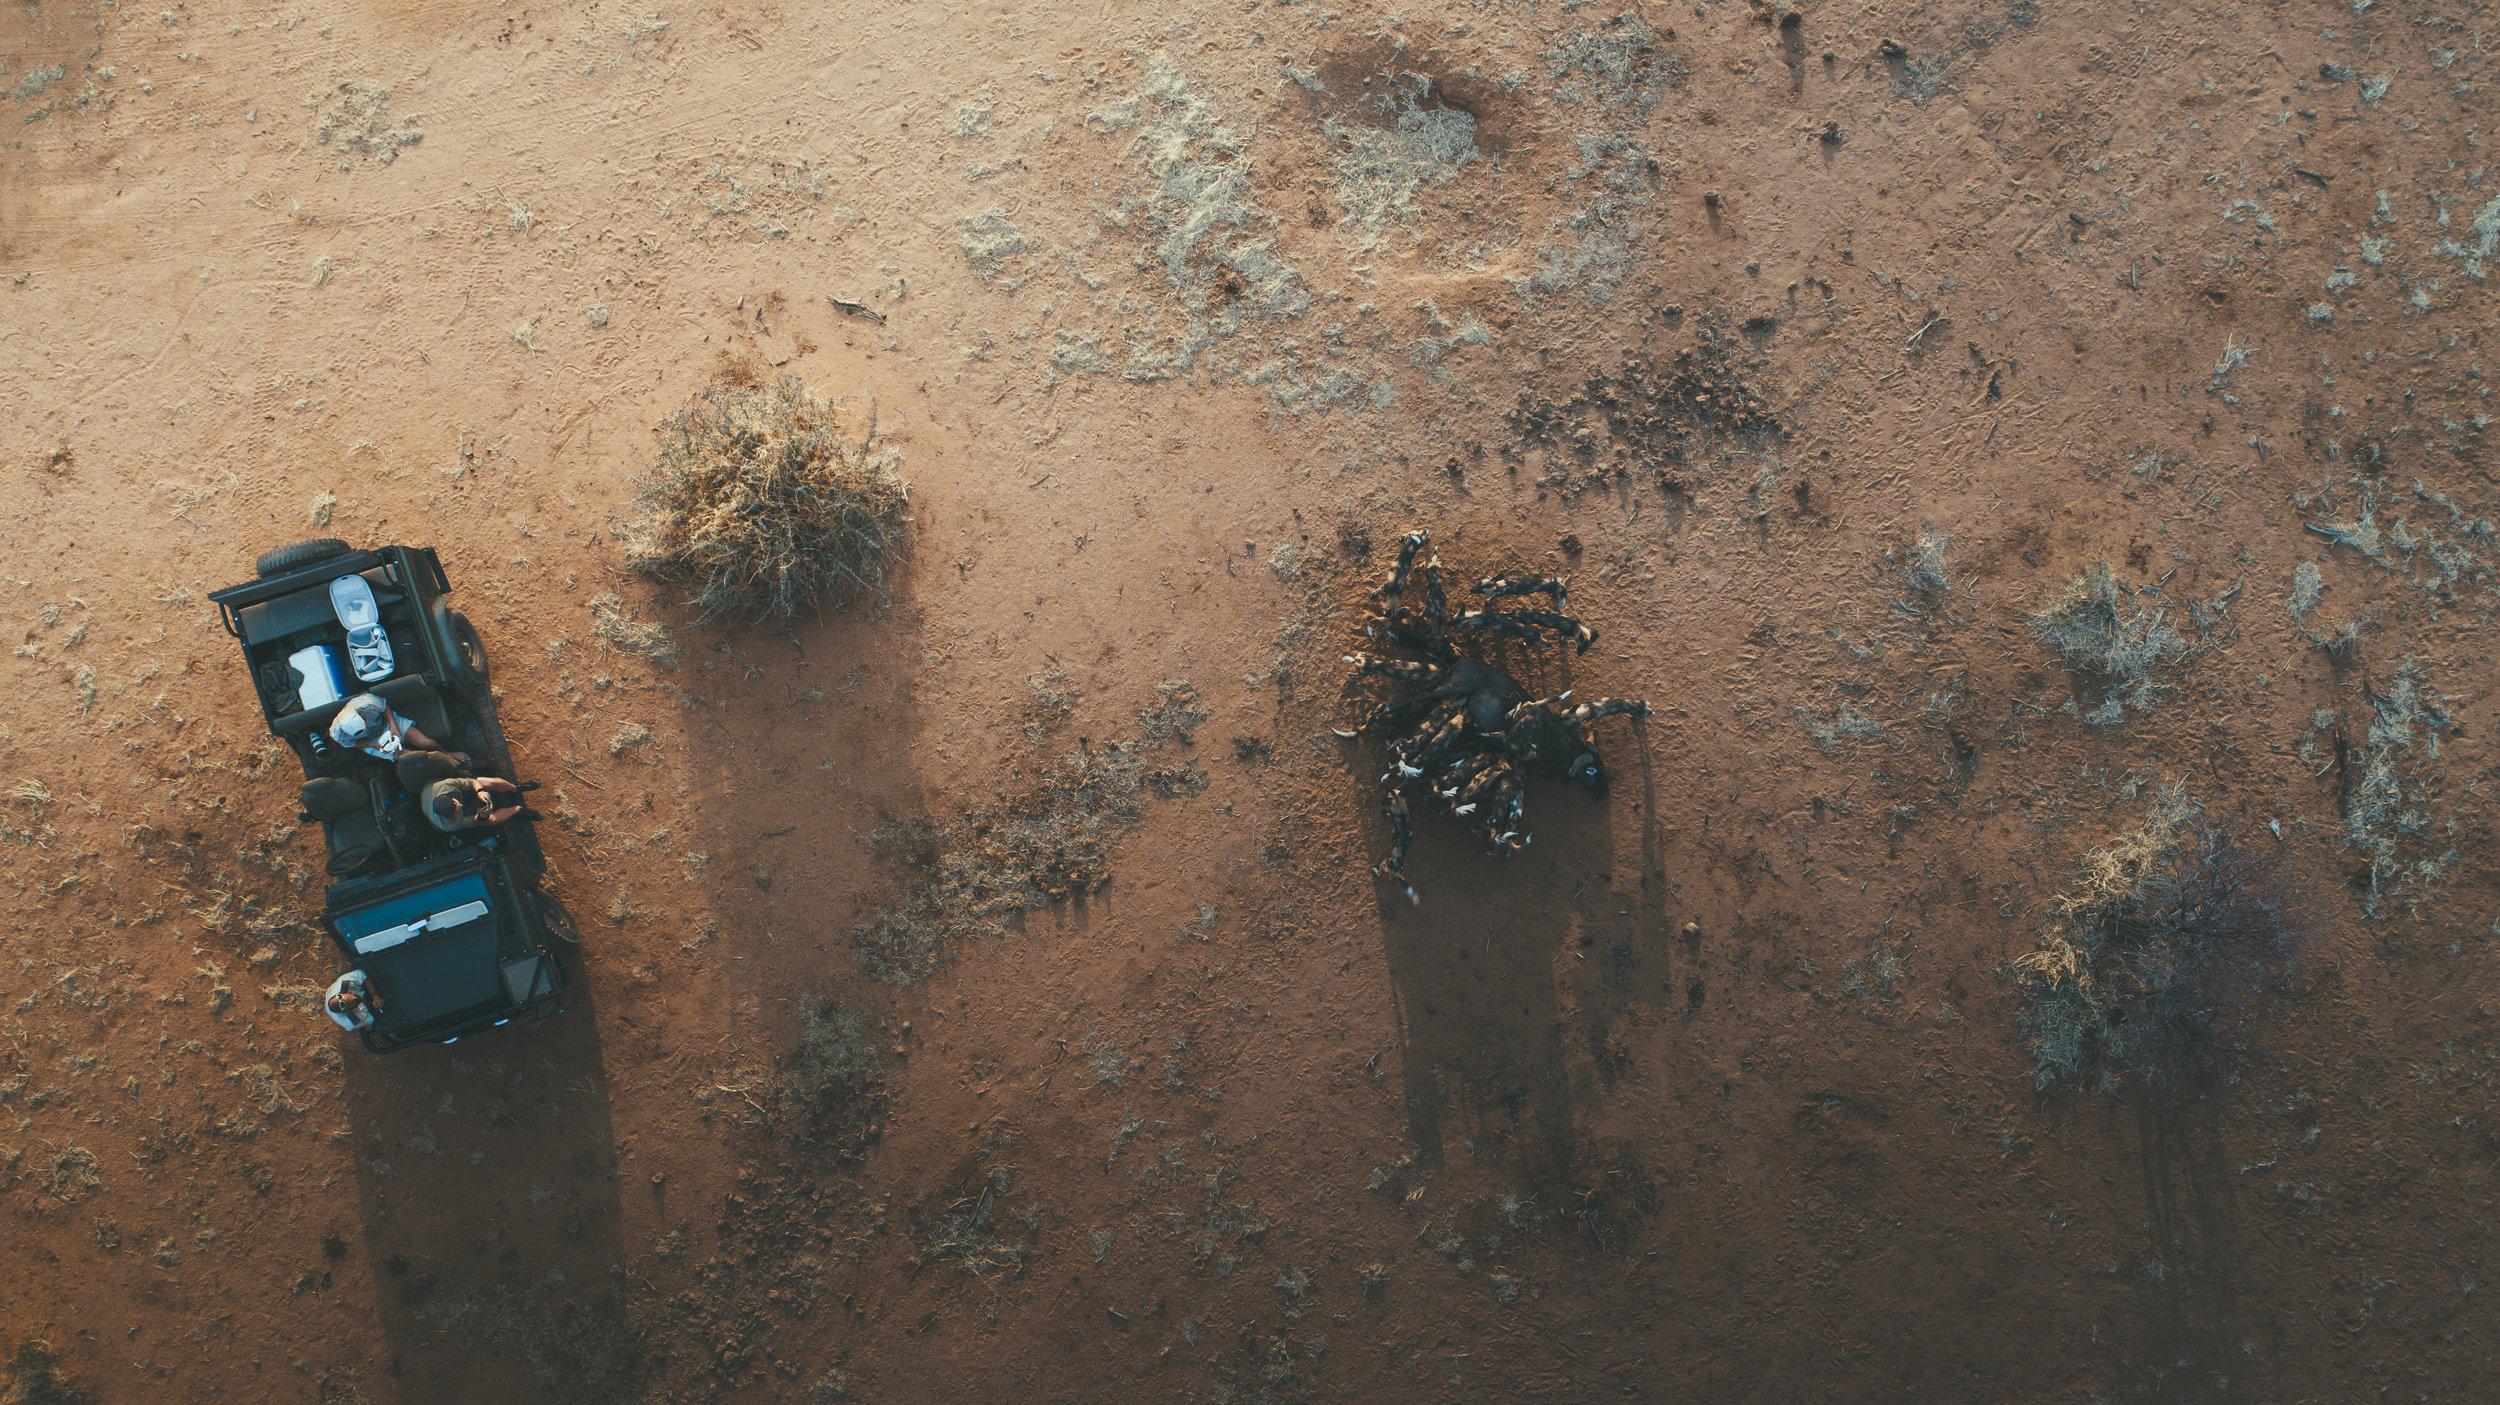 We watch as the wild dogs devour a wildebeest carcass